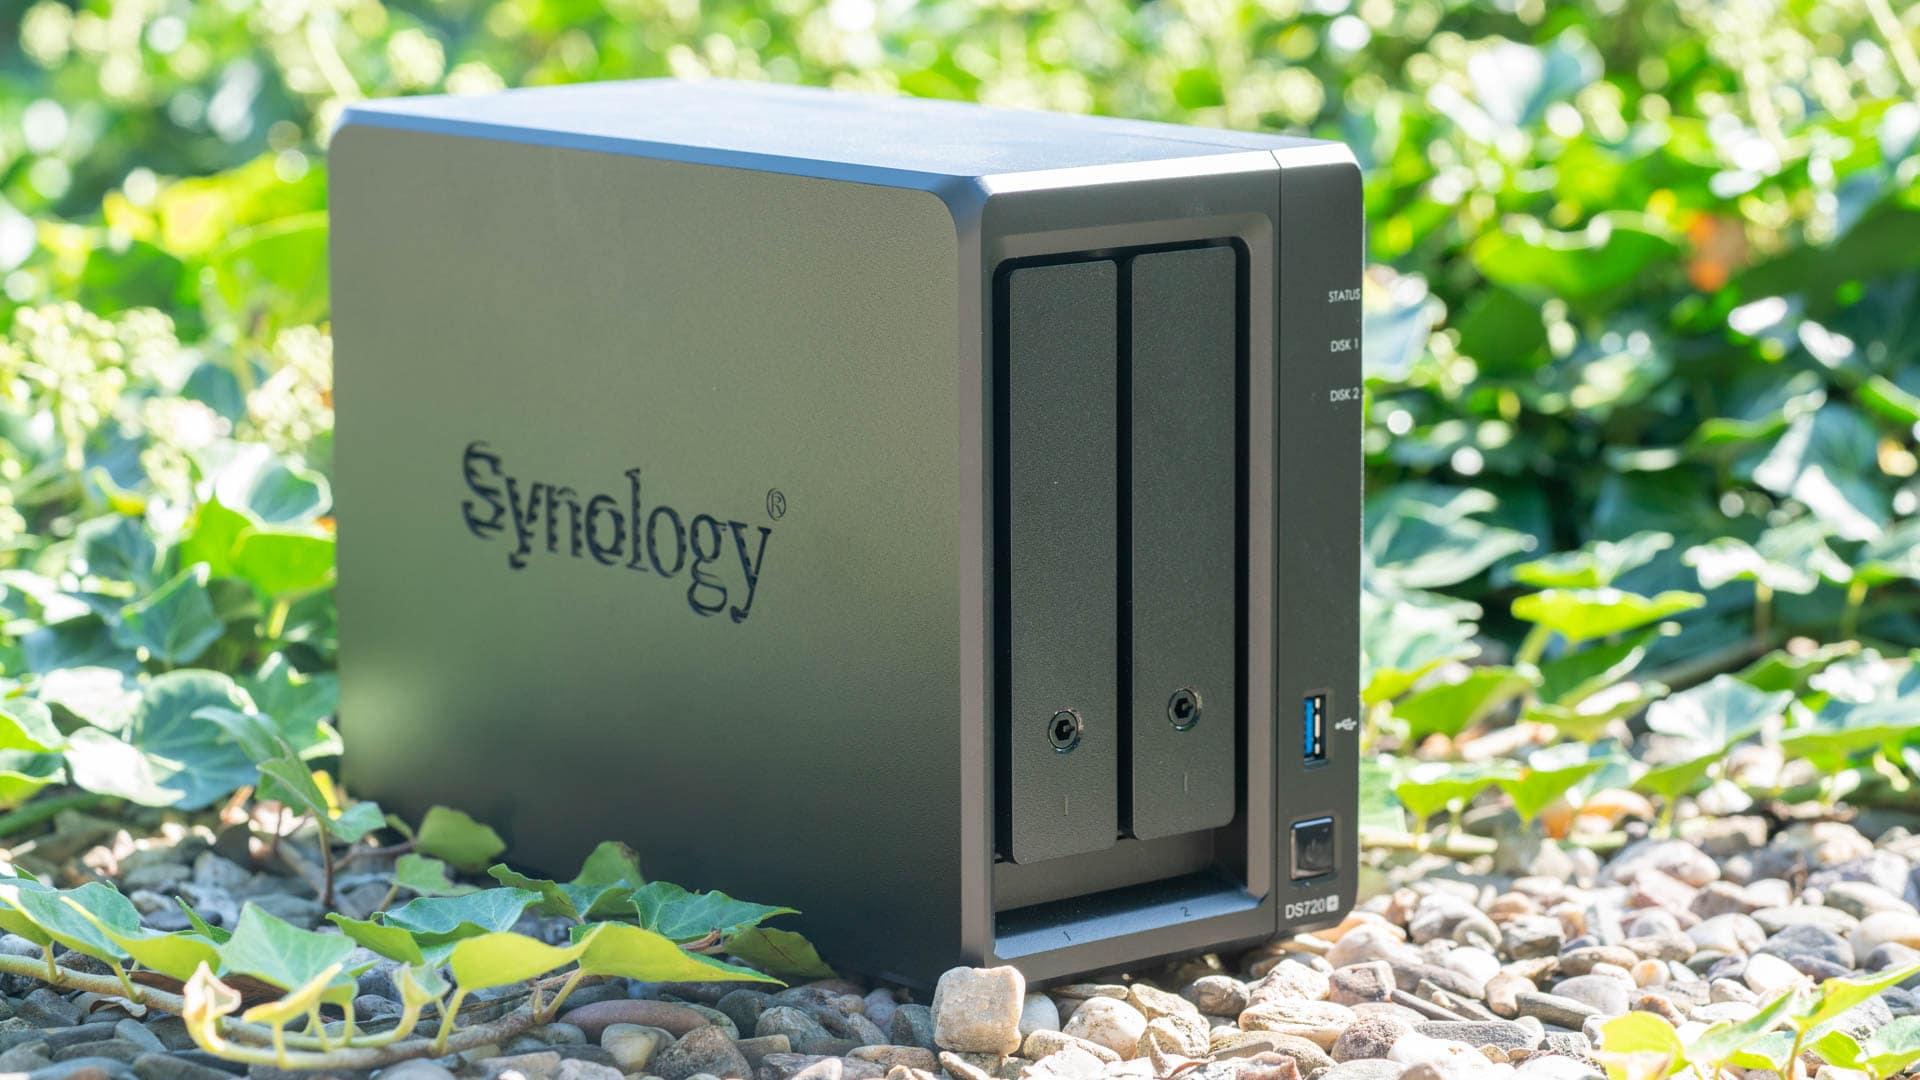 Die Synology DiskStation DS720+ im Test